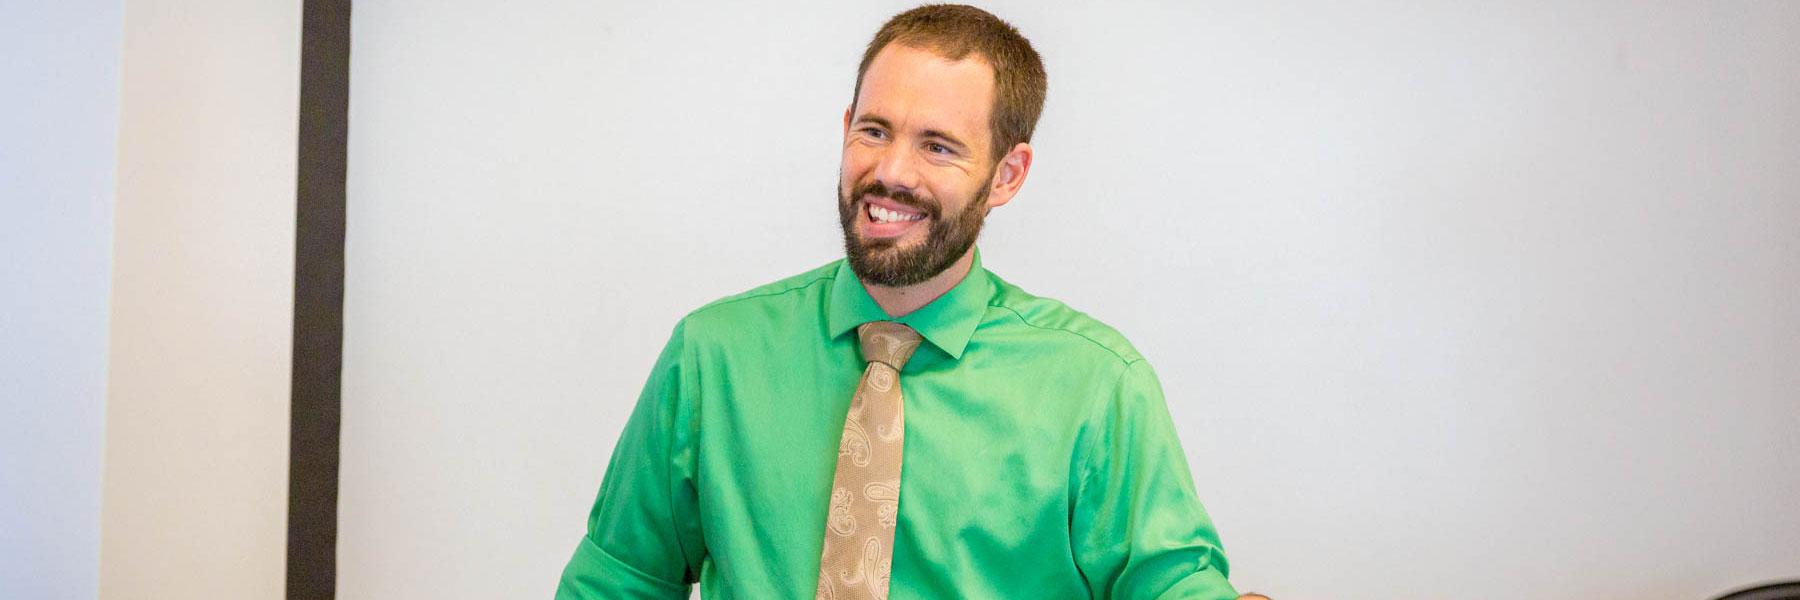 Nick Kaminsky, History Department professor